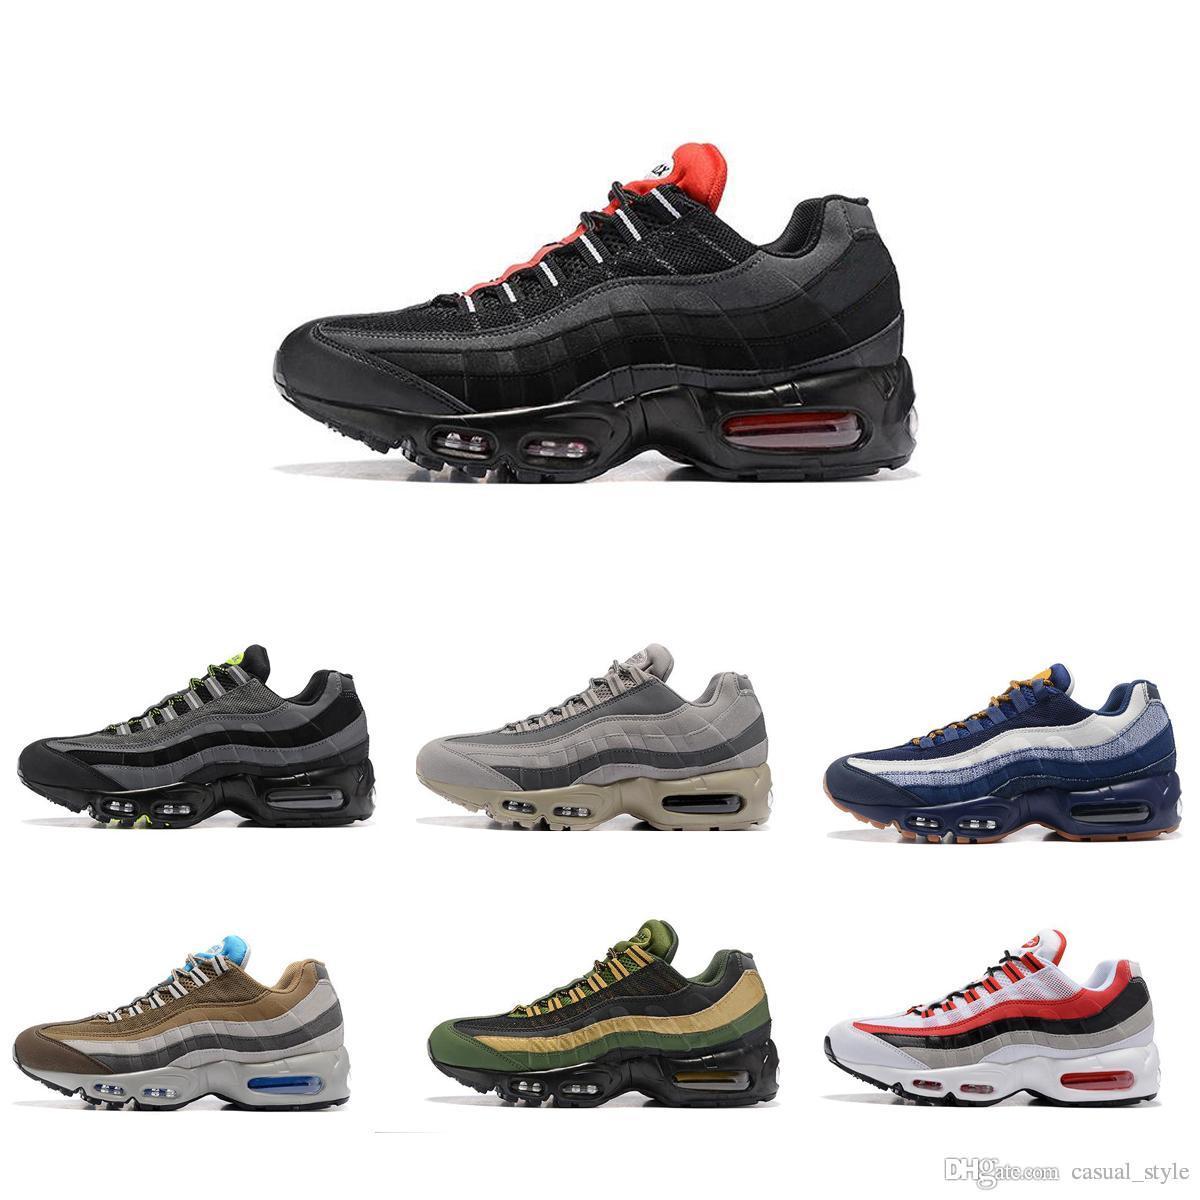 Acquista 2017 Nike Air Max 97 Og Undftd Airmax 97 Og Qs Uomini 95 Og